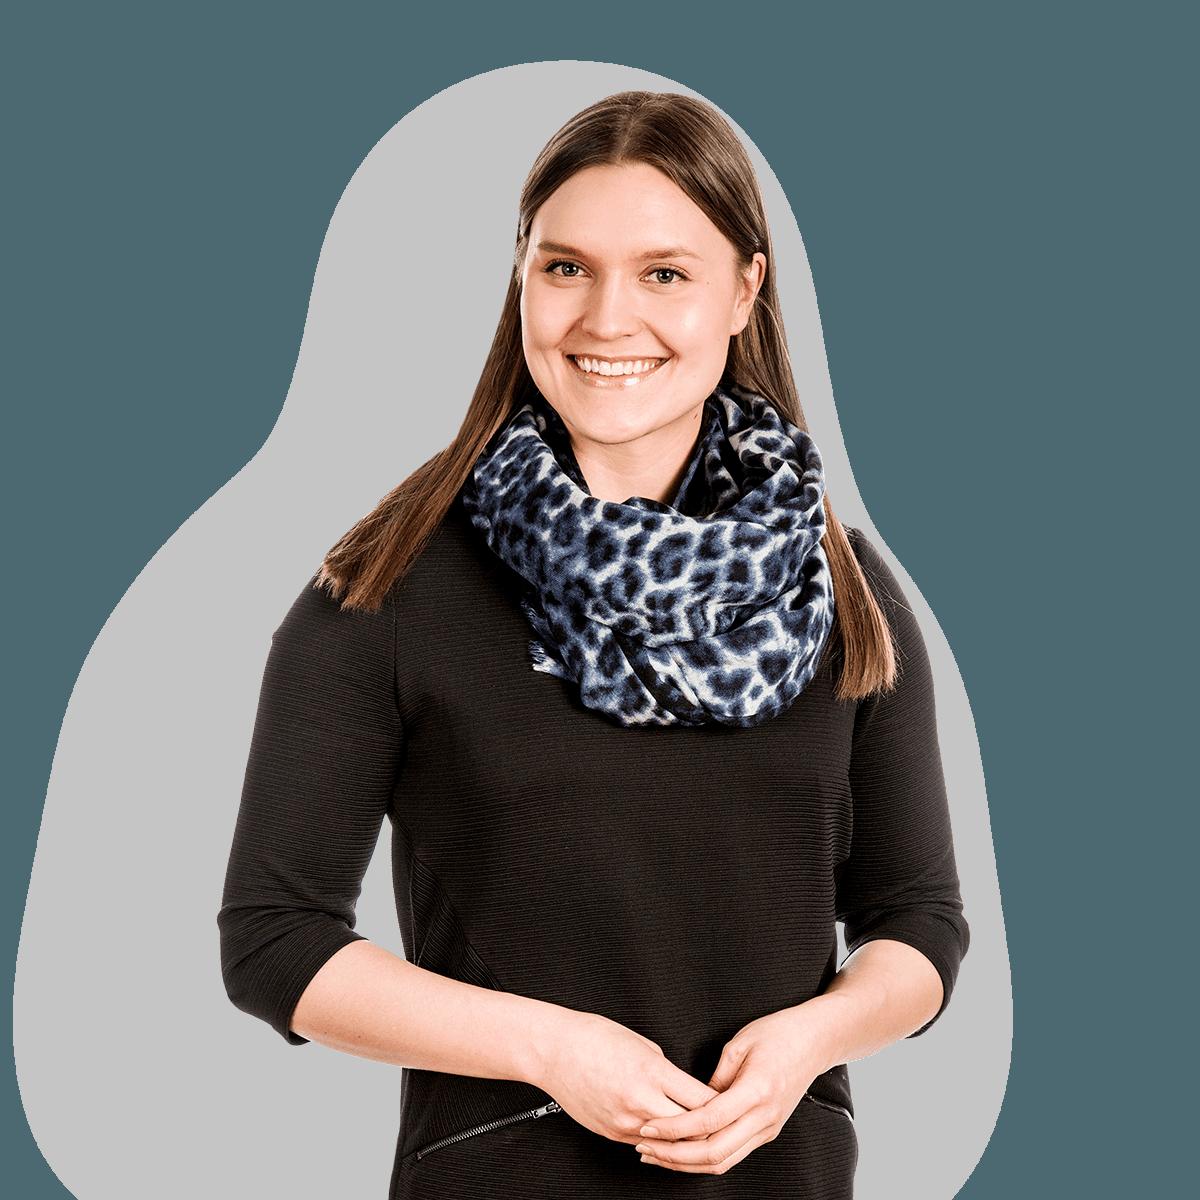 escort estonia isot tissit videot